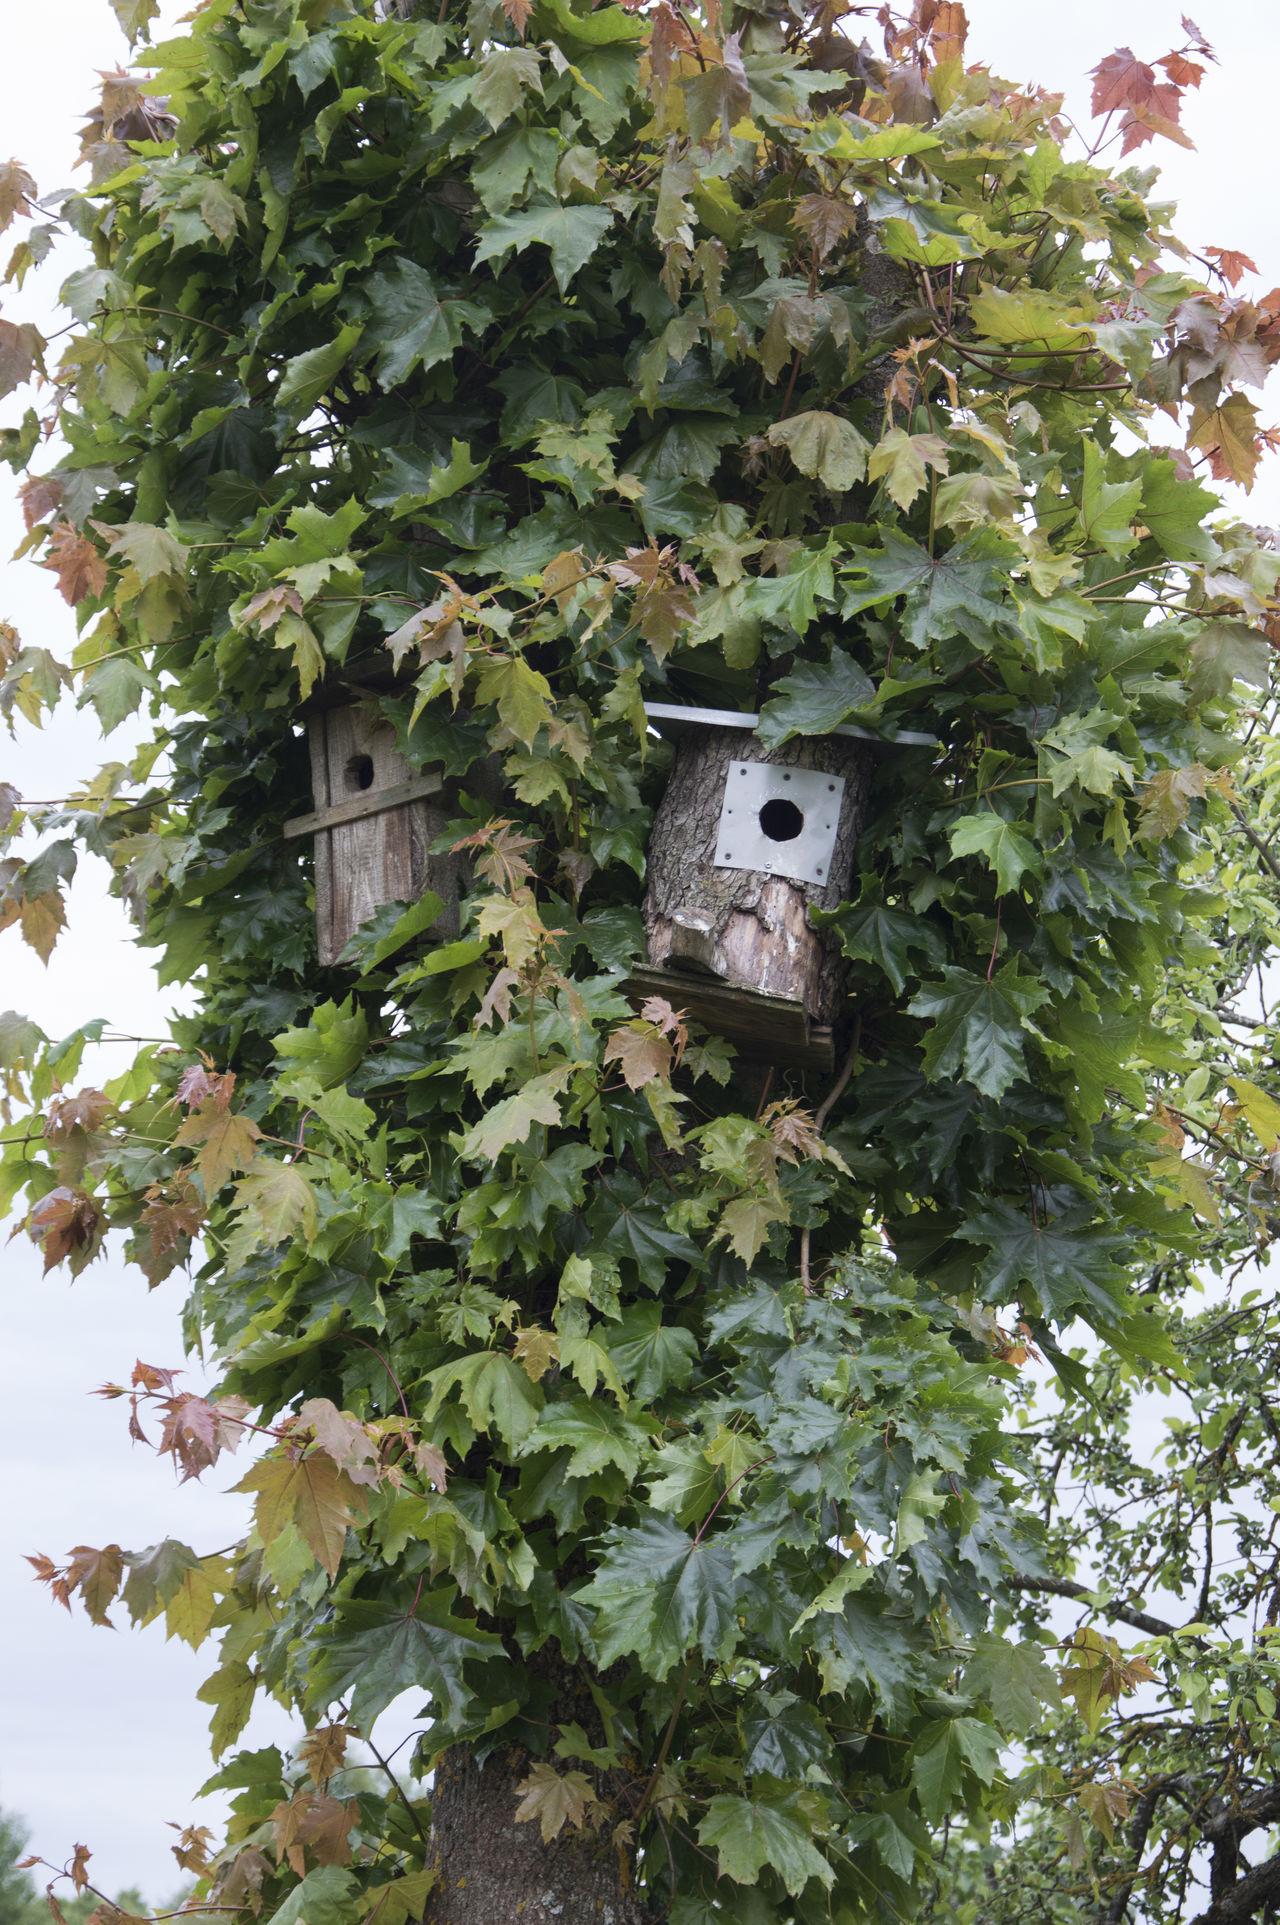 Bird Houses Green Nature Nesting Box Nesting Boxes Nesting Boxes Tree Nistkasten Outdoors Tree Two Two Nesting Boxes Vogelhäuser Birdbox